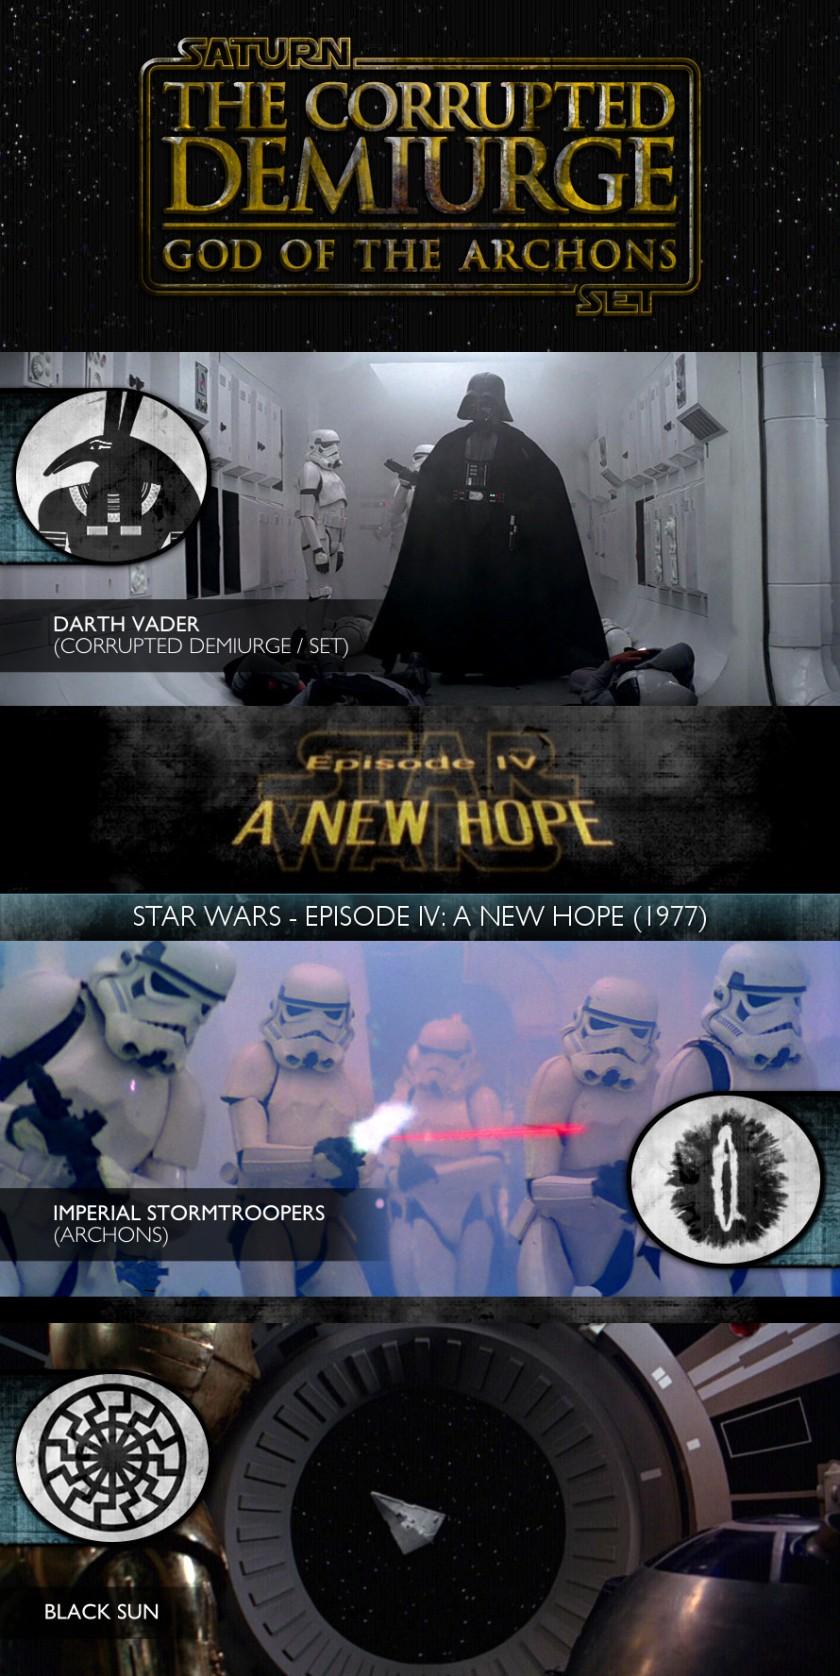 The Corrupted Demiurge - Star Wars - Episode IV - A New Hope (1977) - Darth Vader